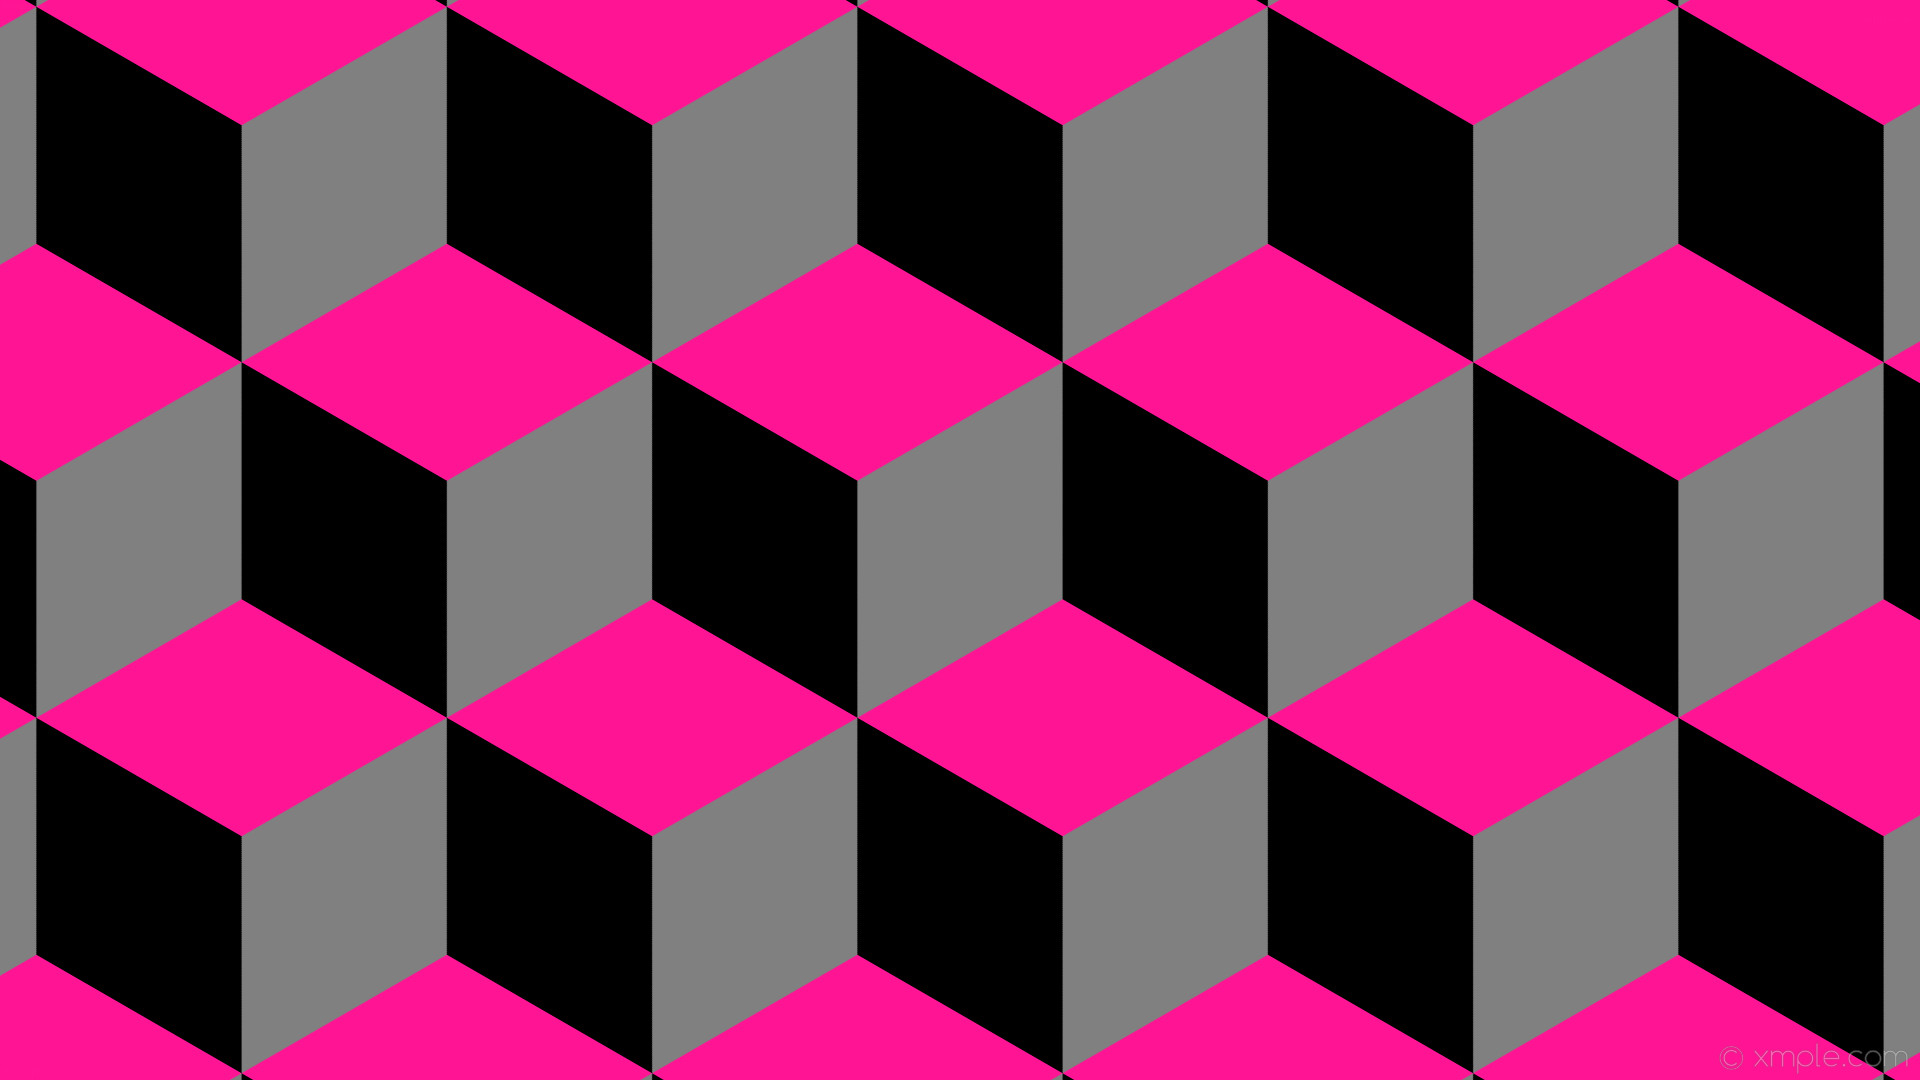 wallpaper pink 3d cubes black grey gray deep pink #808080 #ff1493 #000000  240